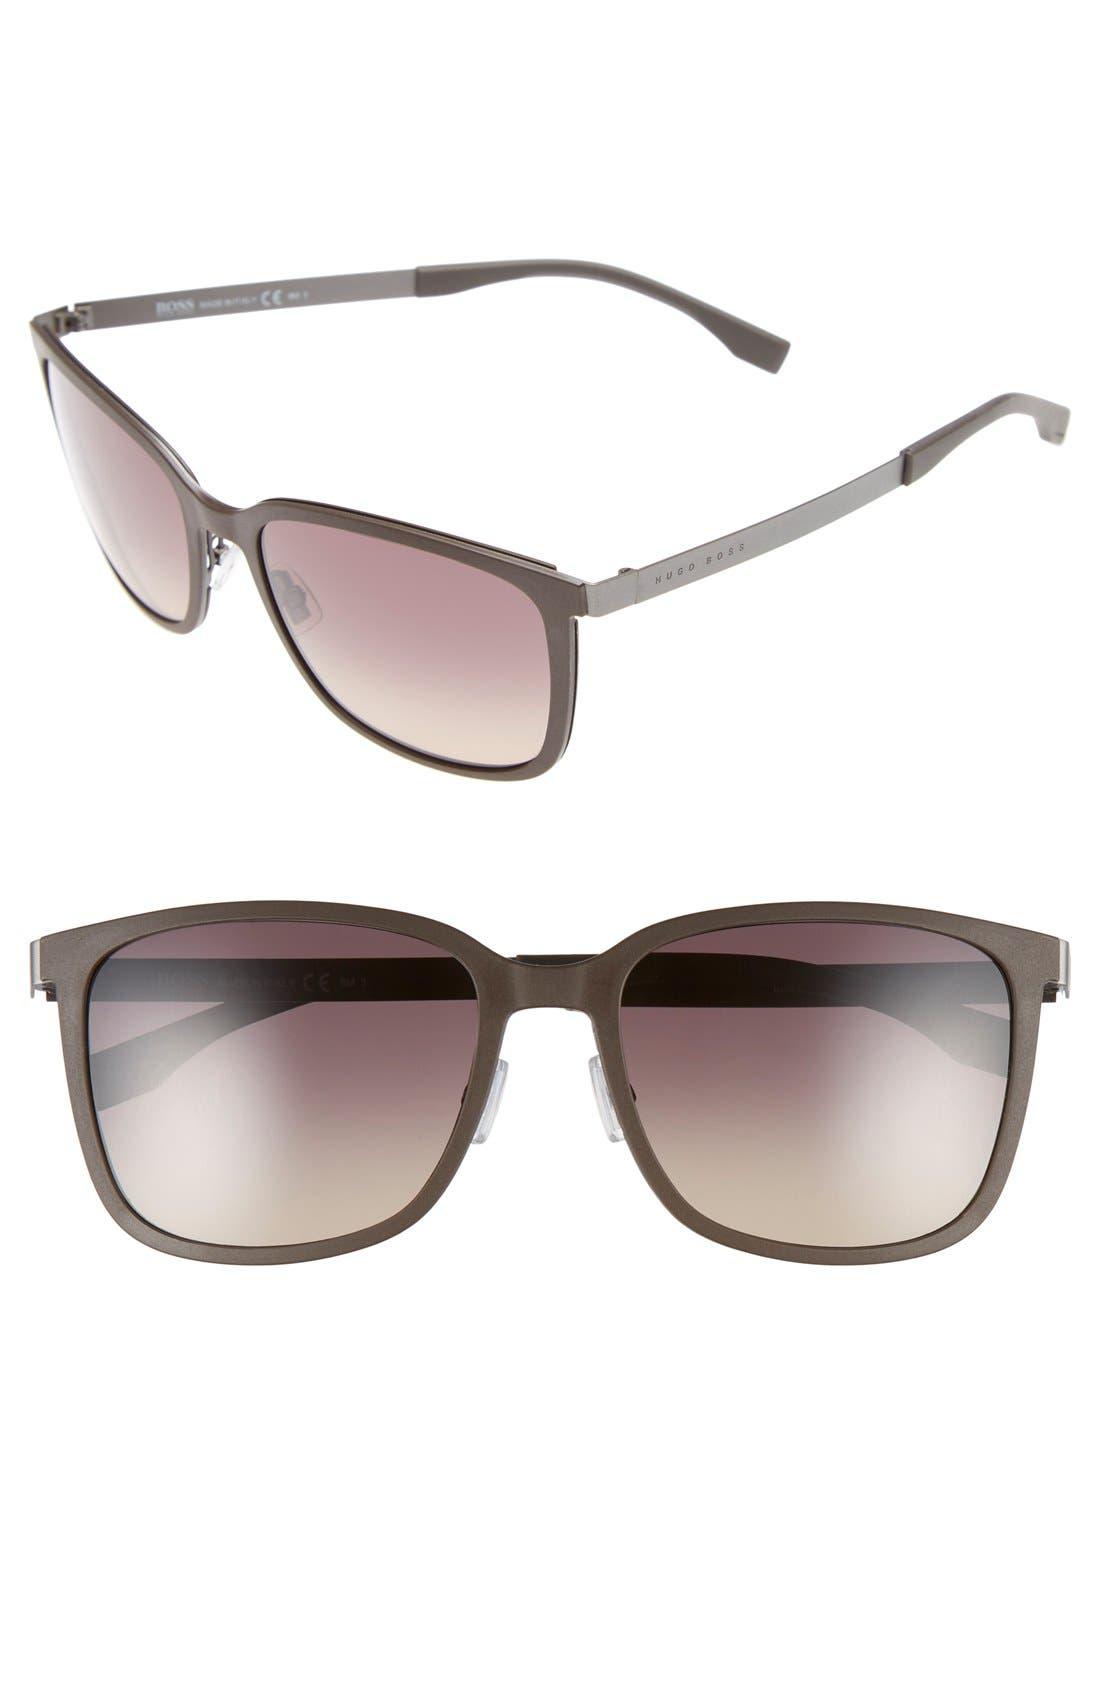 56mm Retro Sunglasses,                             Main thumbnail 1, color,                             RUTHENIUM/GRAY/ GREEN GRADIENT